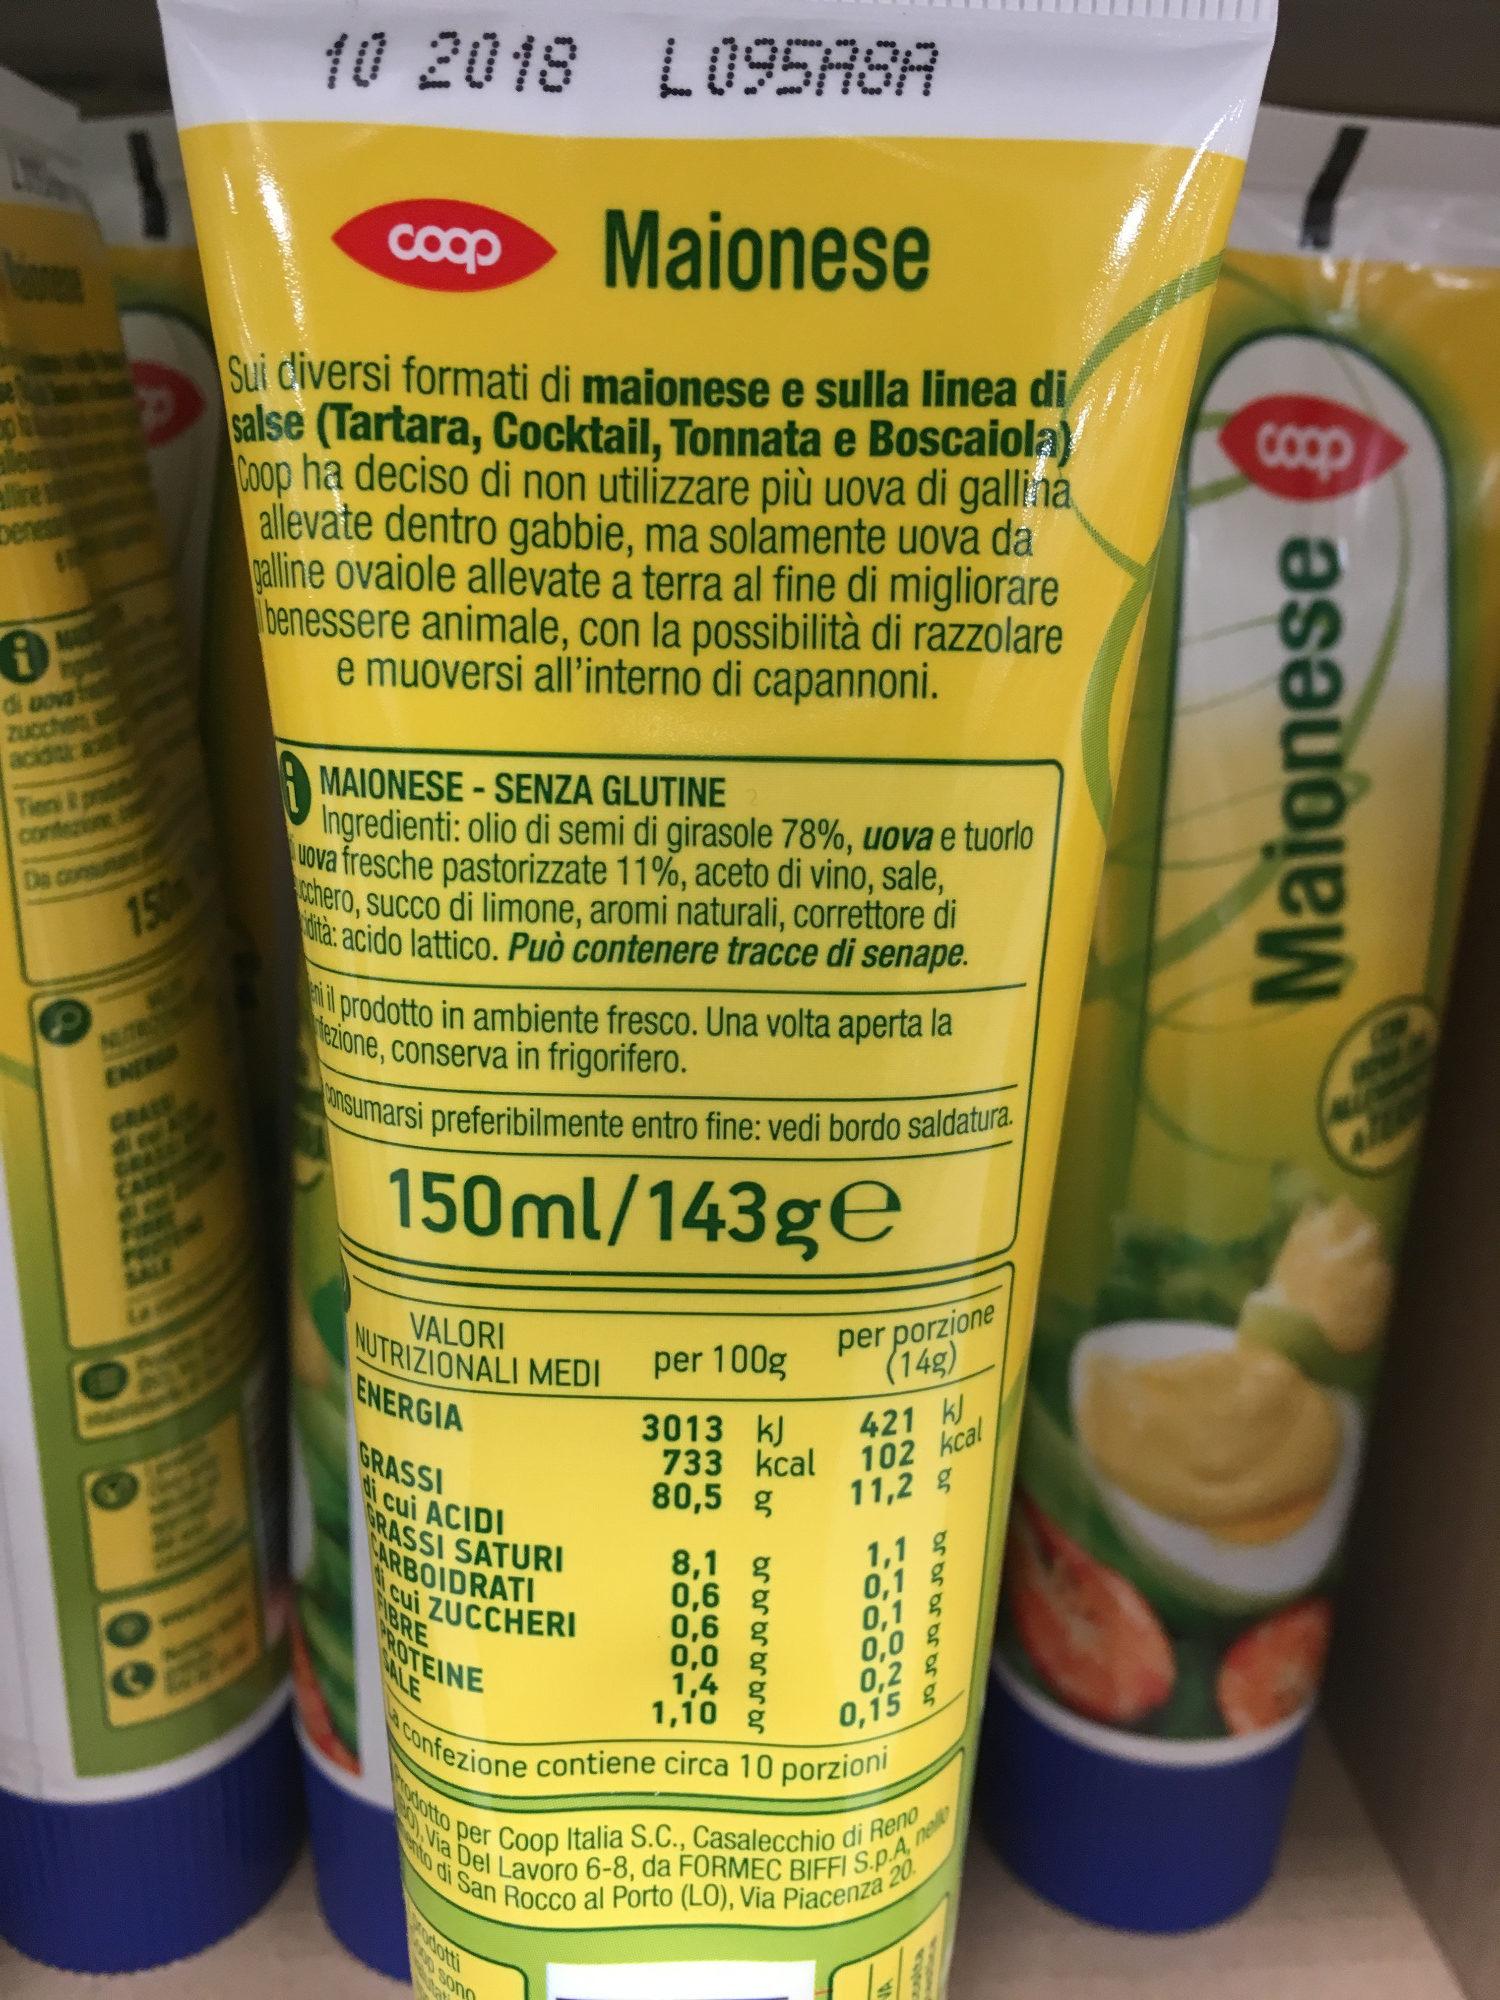 Maionese Coop - Ingredients - it